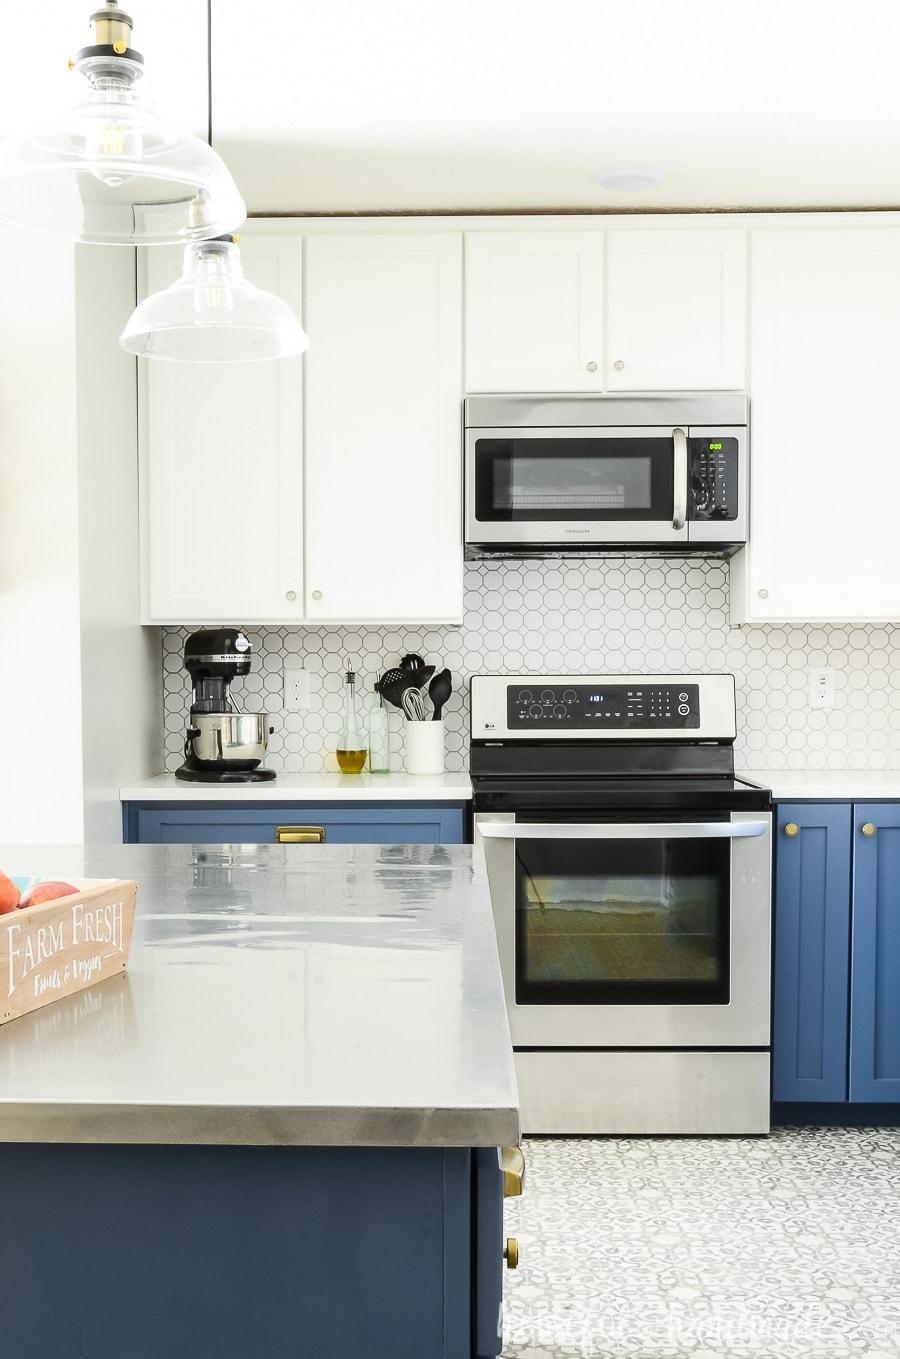 Building Wall Cabinets : building, cabinets, Build, Cabinets, Houseful, Handmade